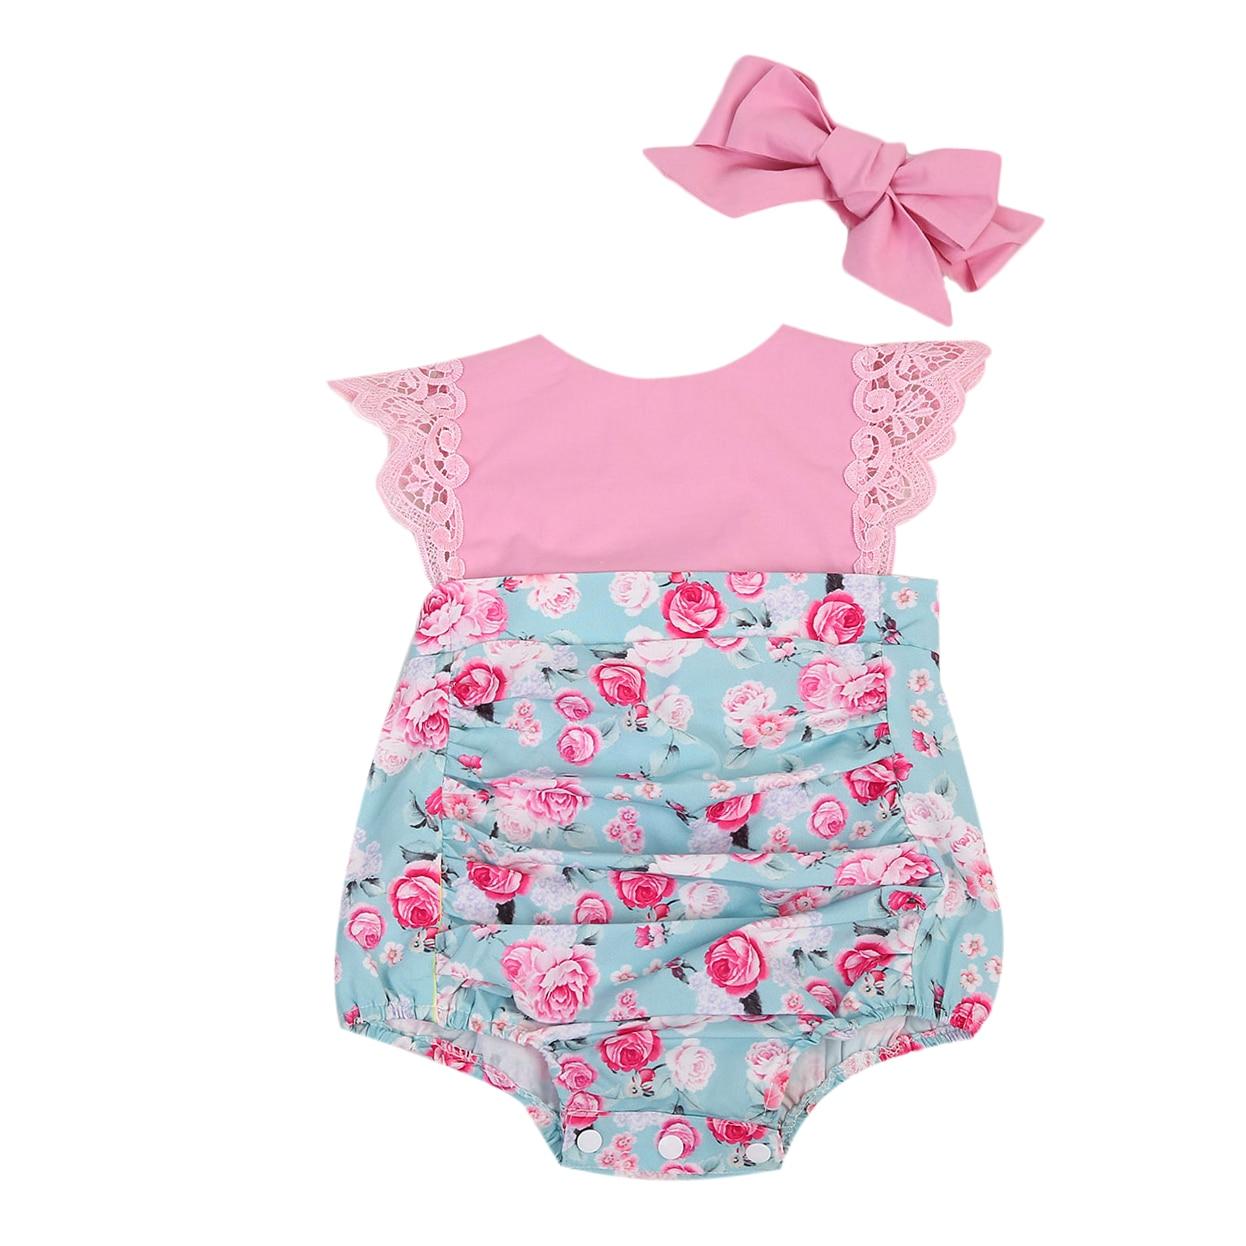 Pudcoco Baby Girls Kids Floral Princess Dress Flower Lovely Lace Romper Summer Dresses Headband Toddler Children Girl Clothing